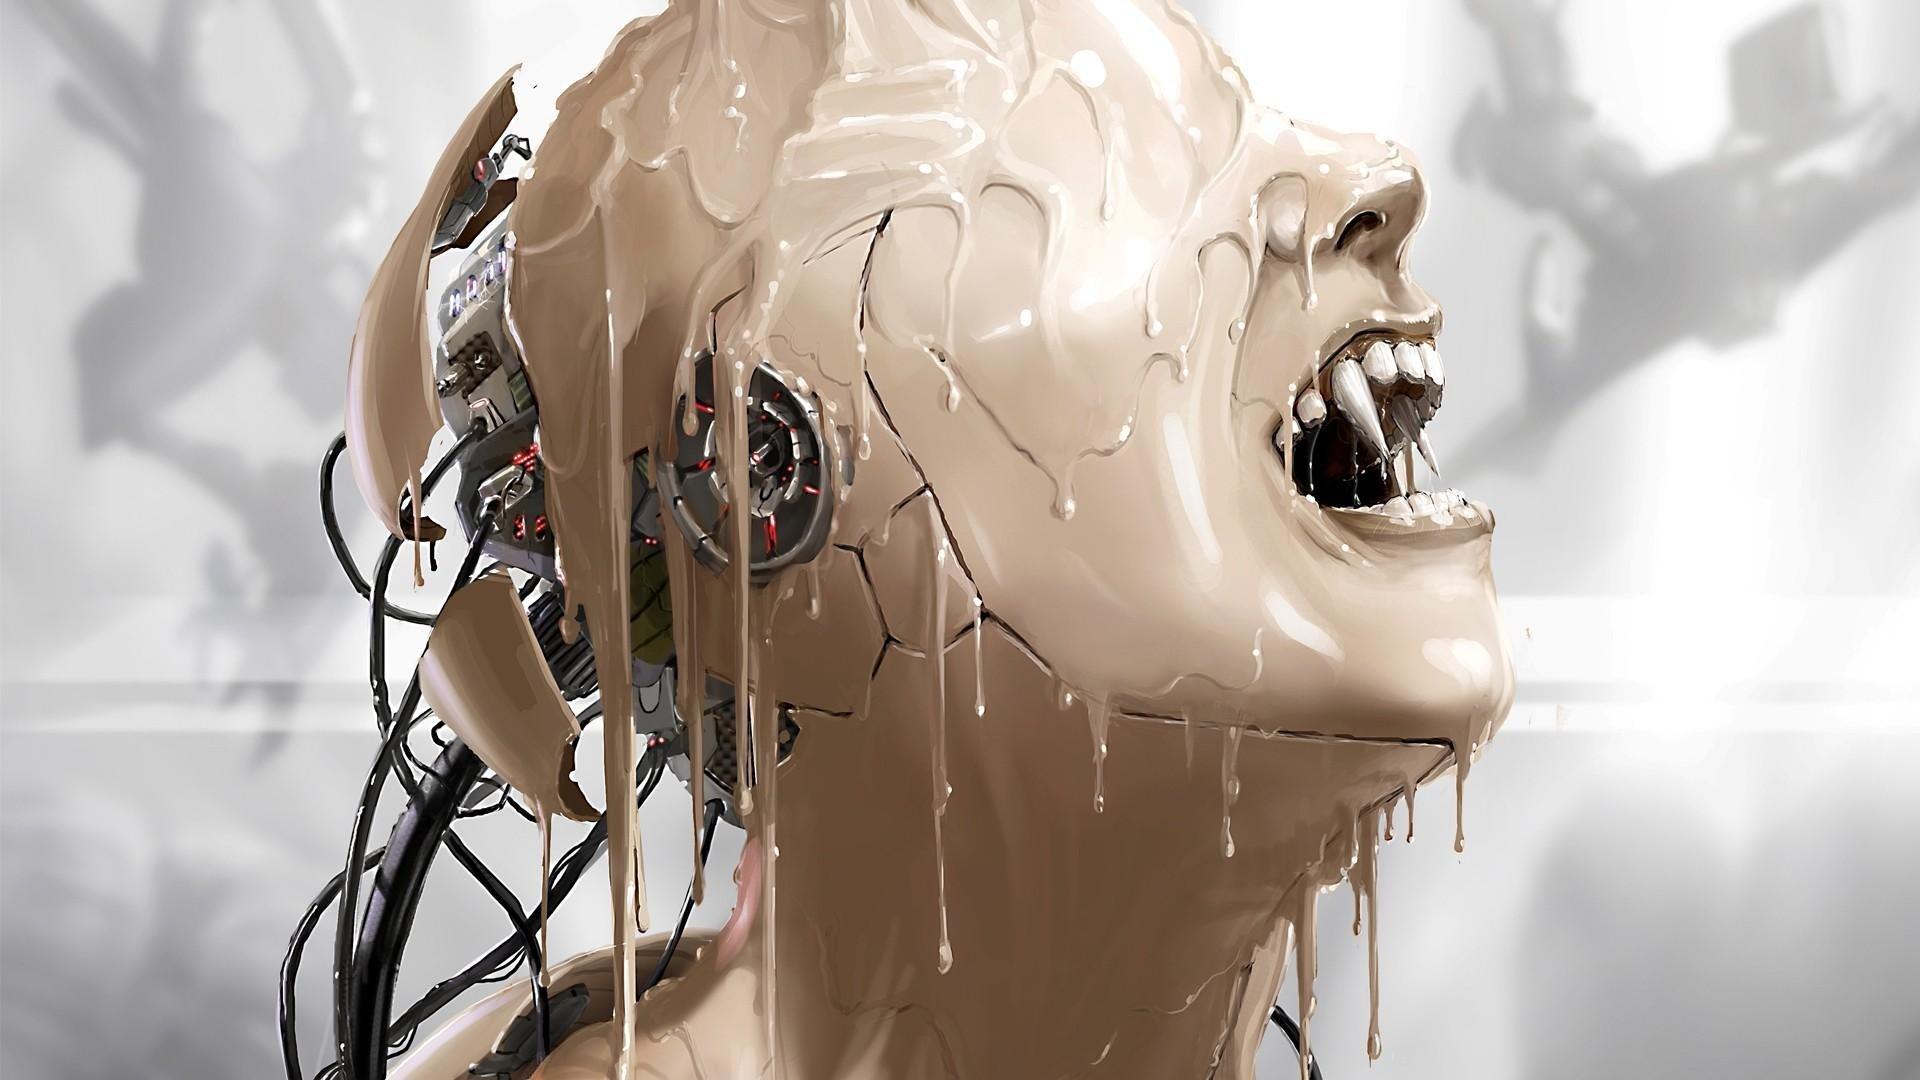 cyborg_paint_robot_vampire_fangs_62574_1920x1080